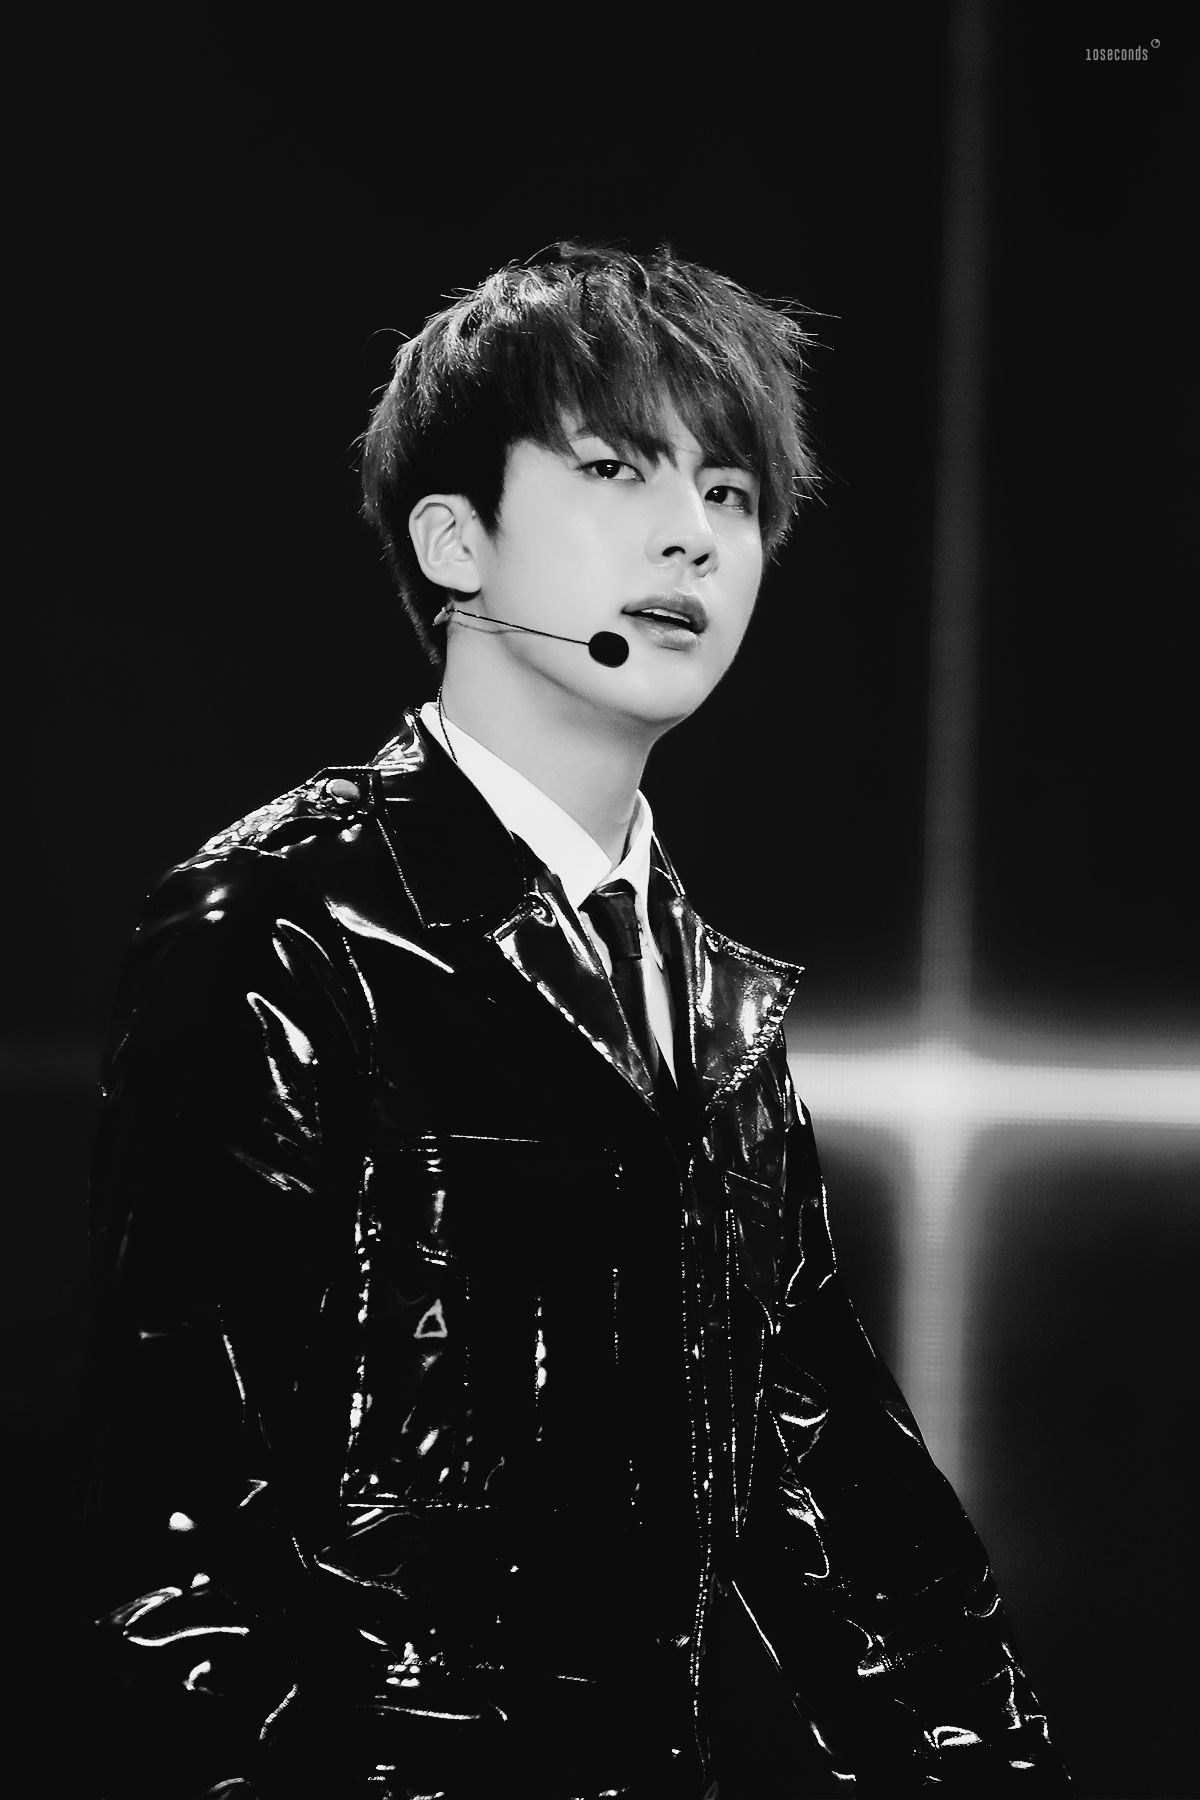 BTS Jin © 10 SECONDS   Do not edit.